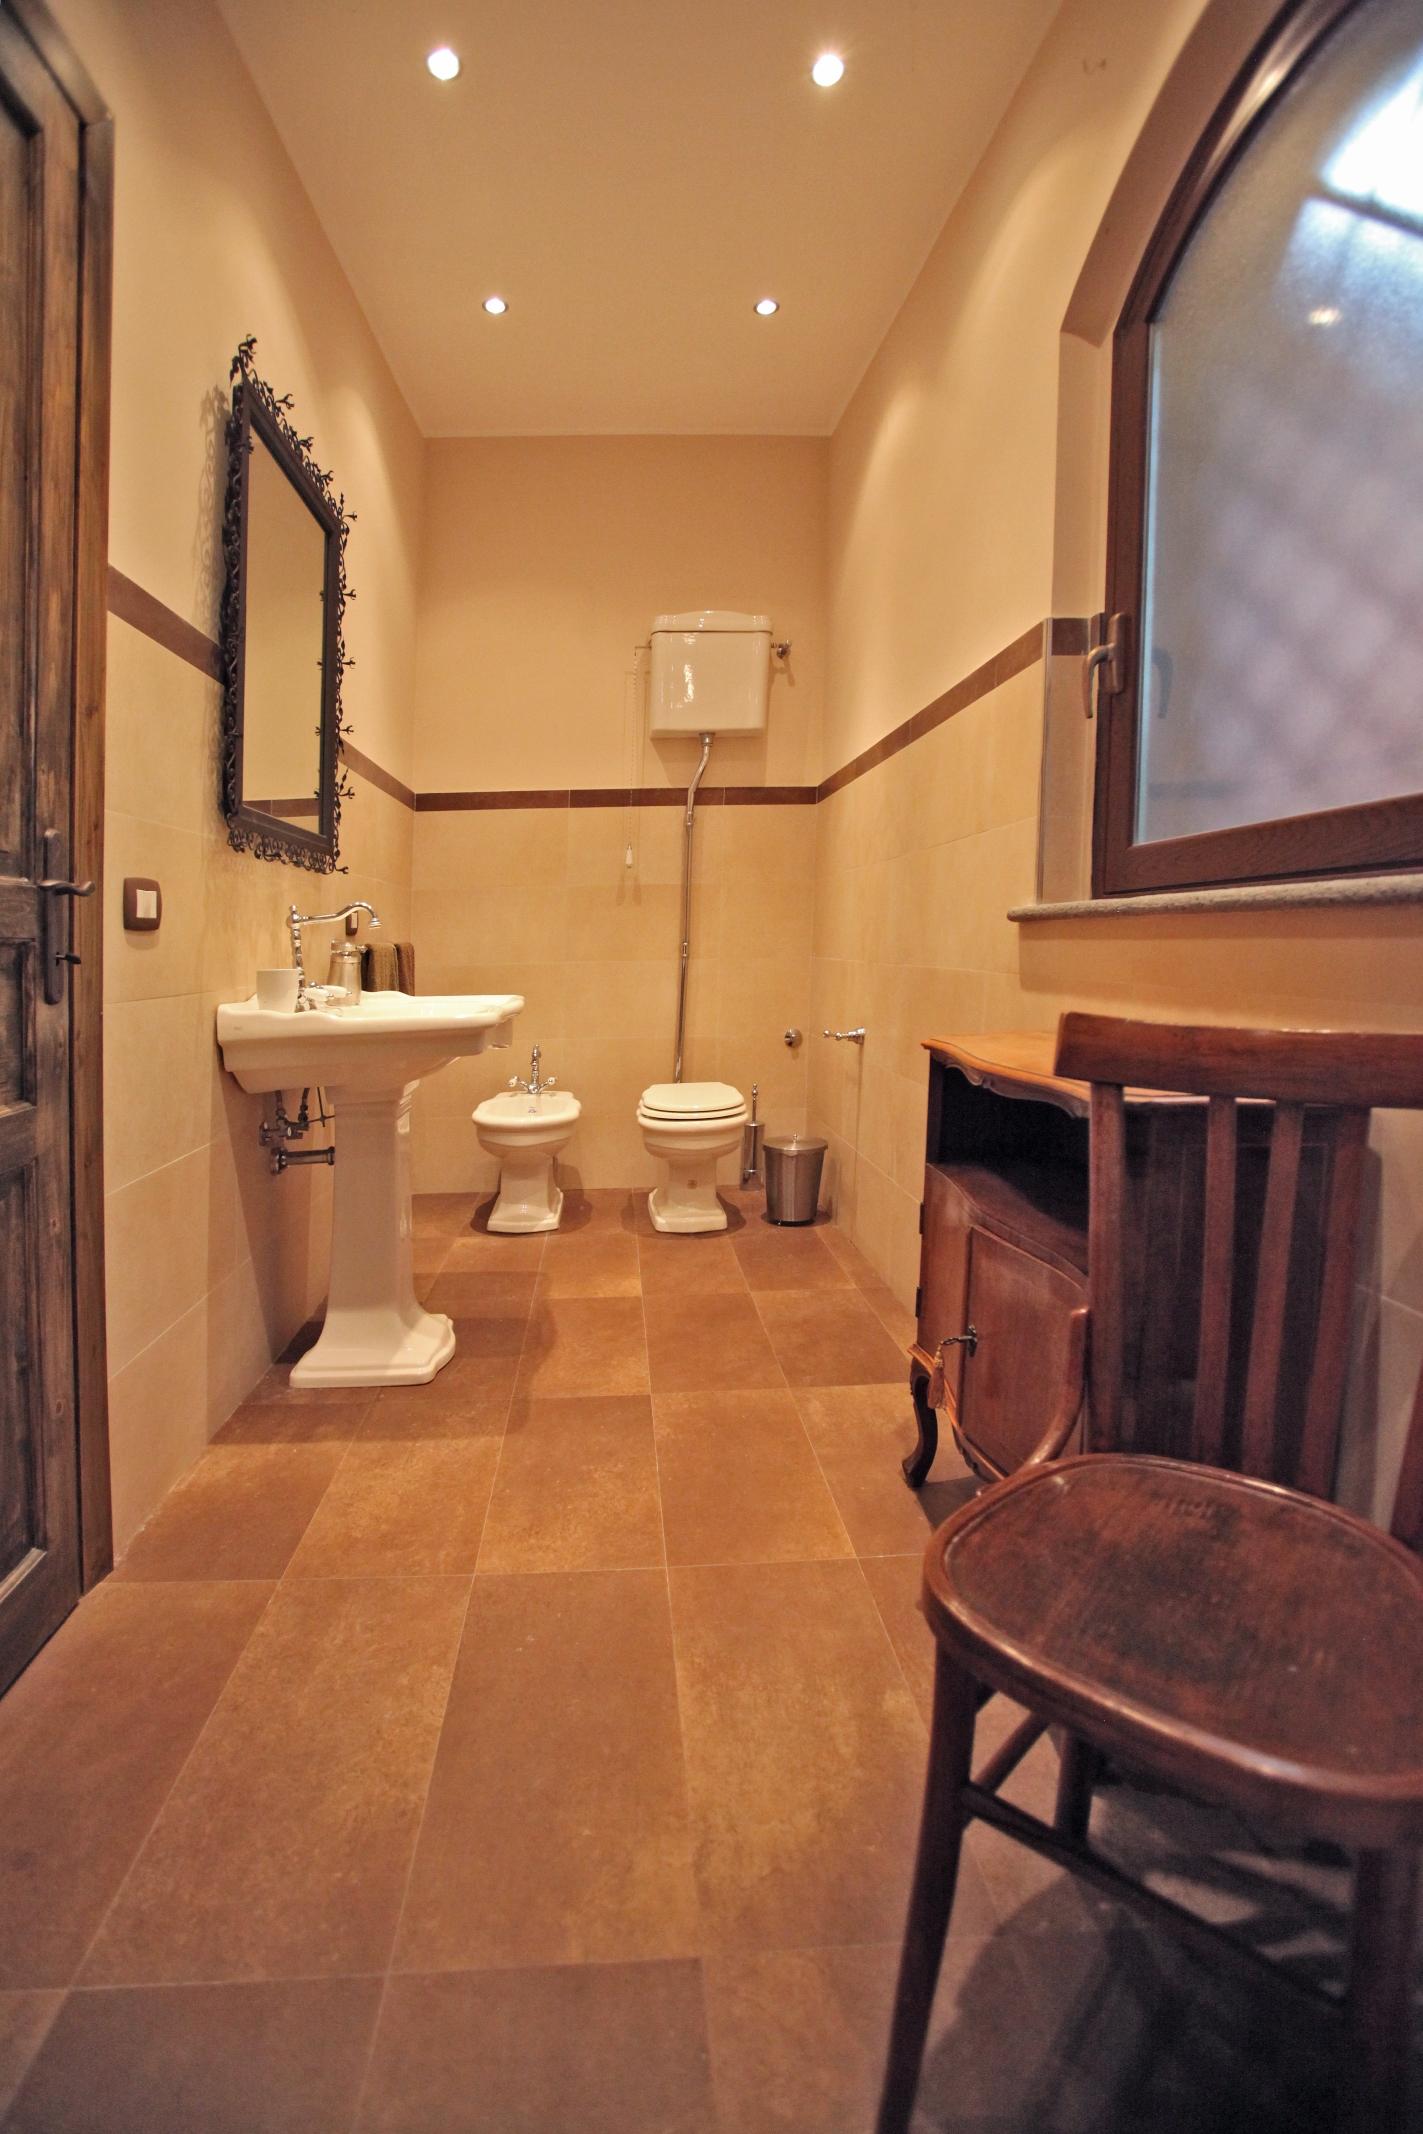 Maison de vacances A Casa di Ludo mit parkplatz (2124257), Catania, Catania, Sicile, Italie, image 27